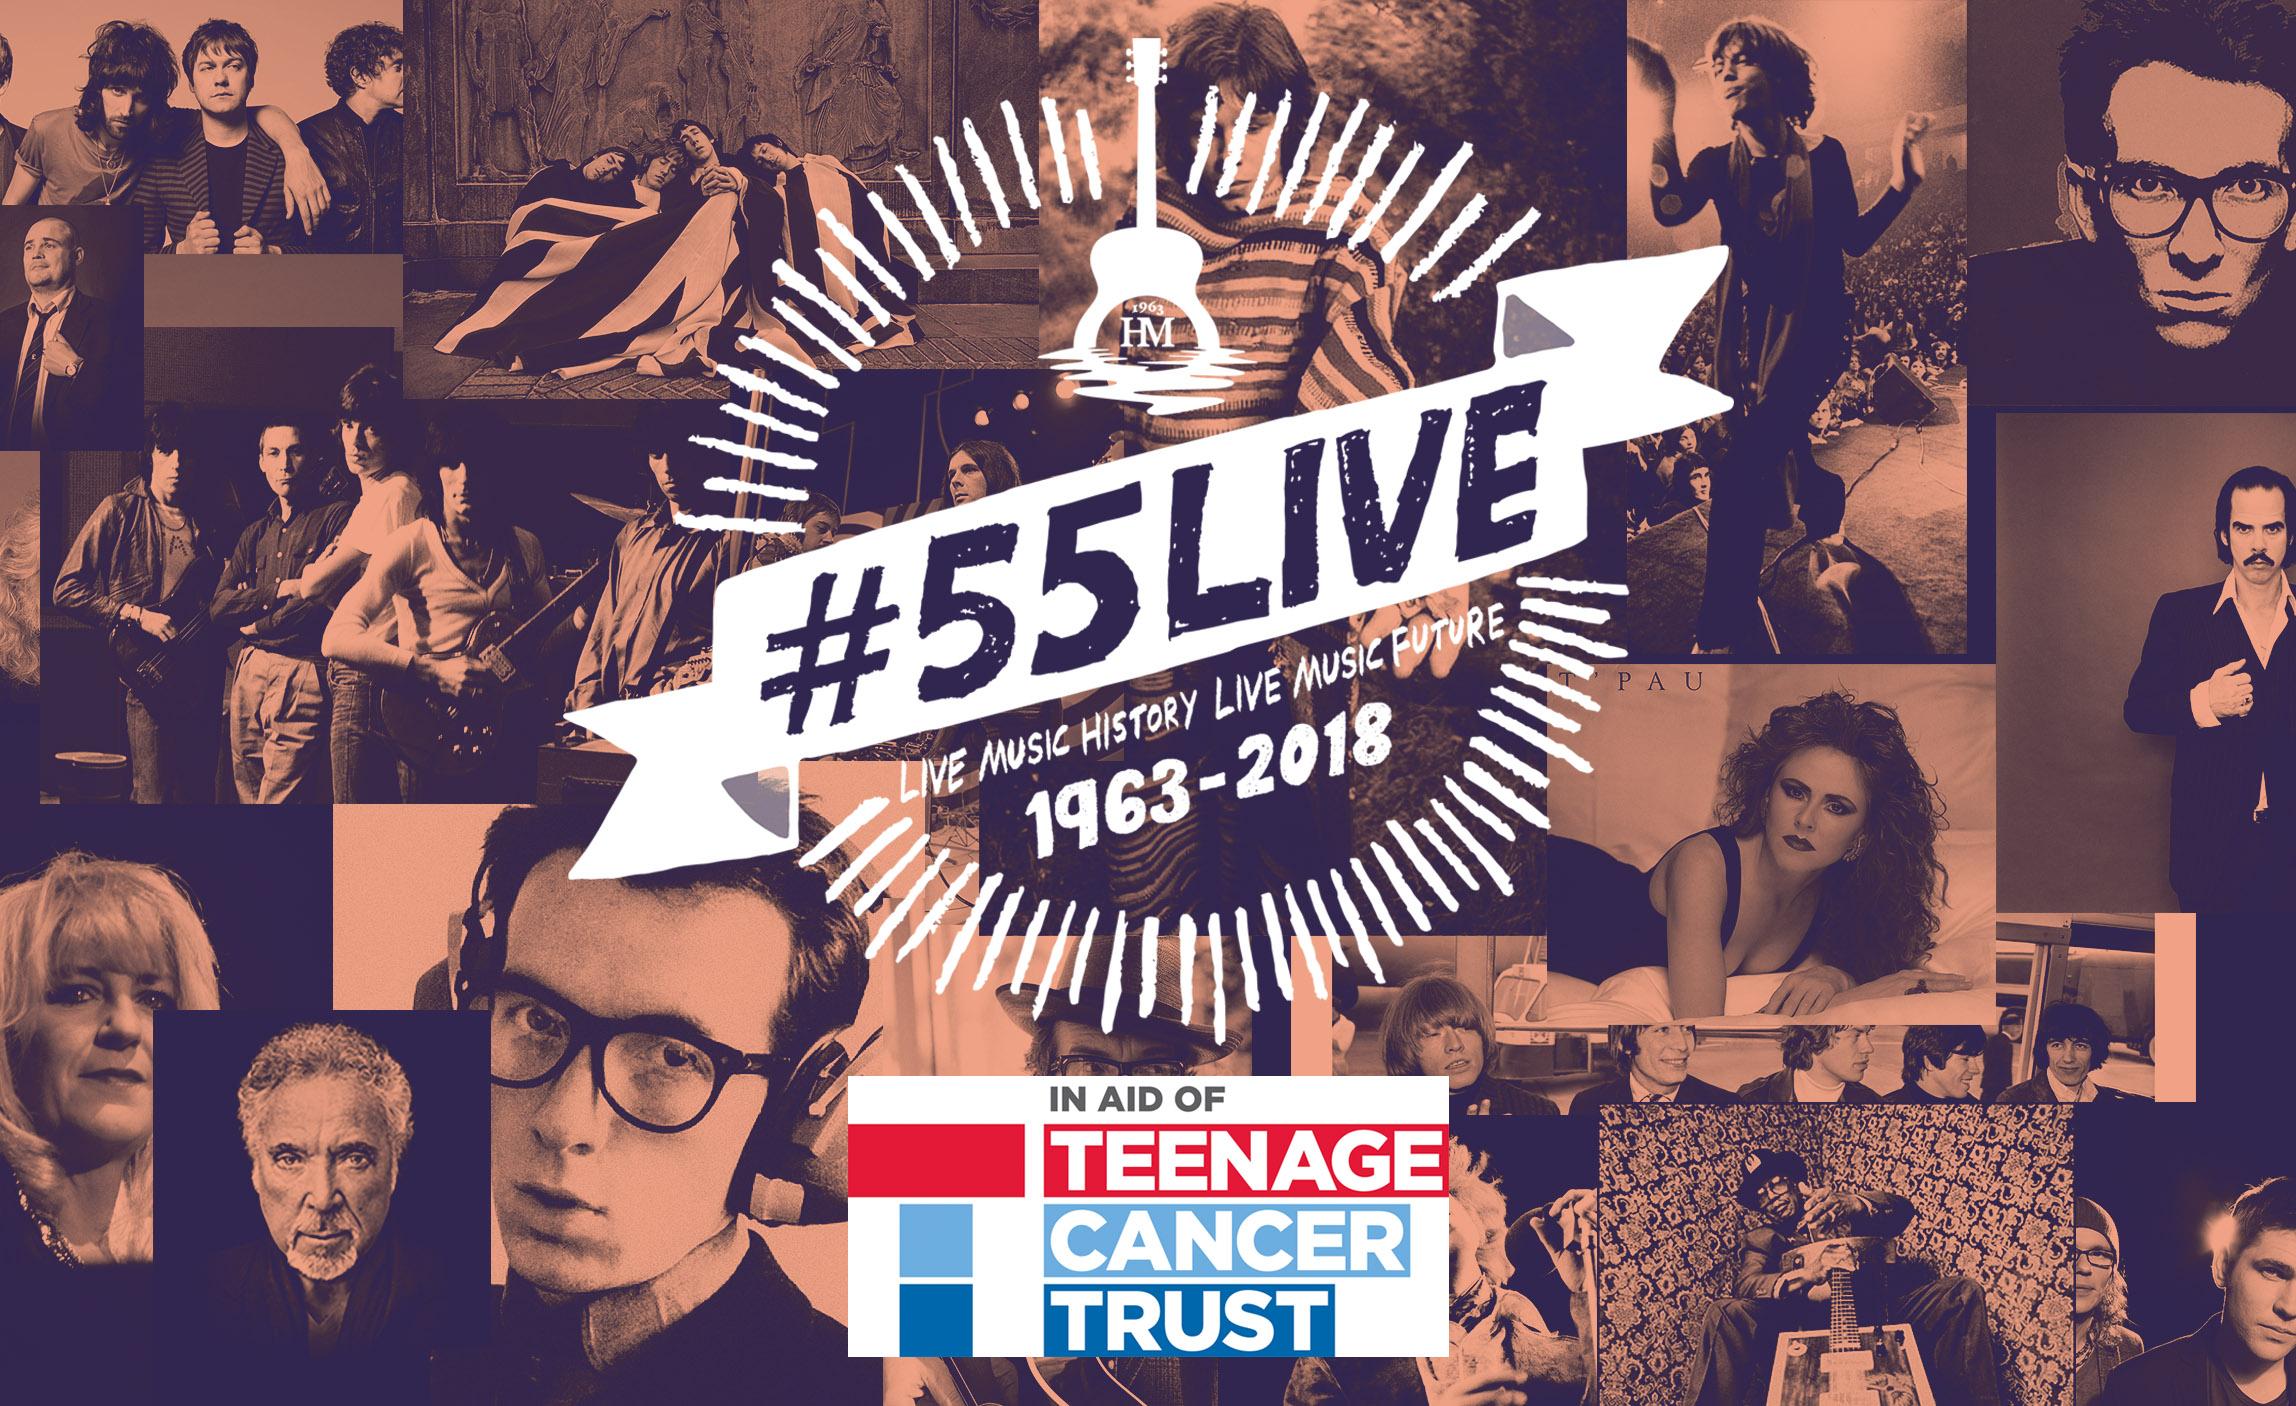 Teenage Cancer Trust Donation - 55LIVE - The Half Moon Putney